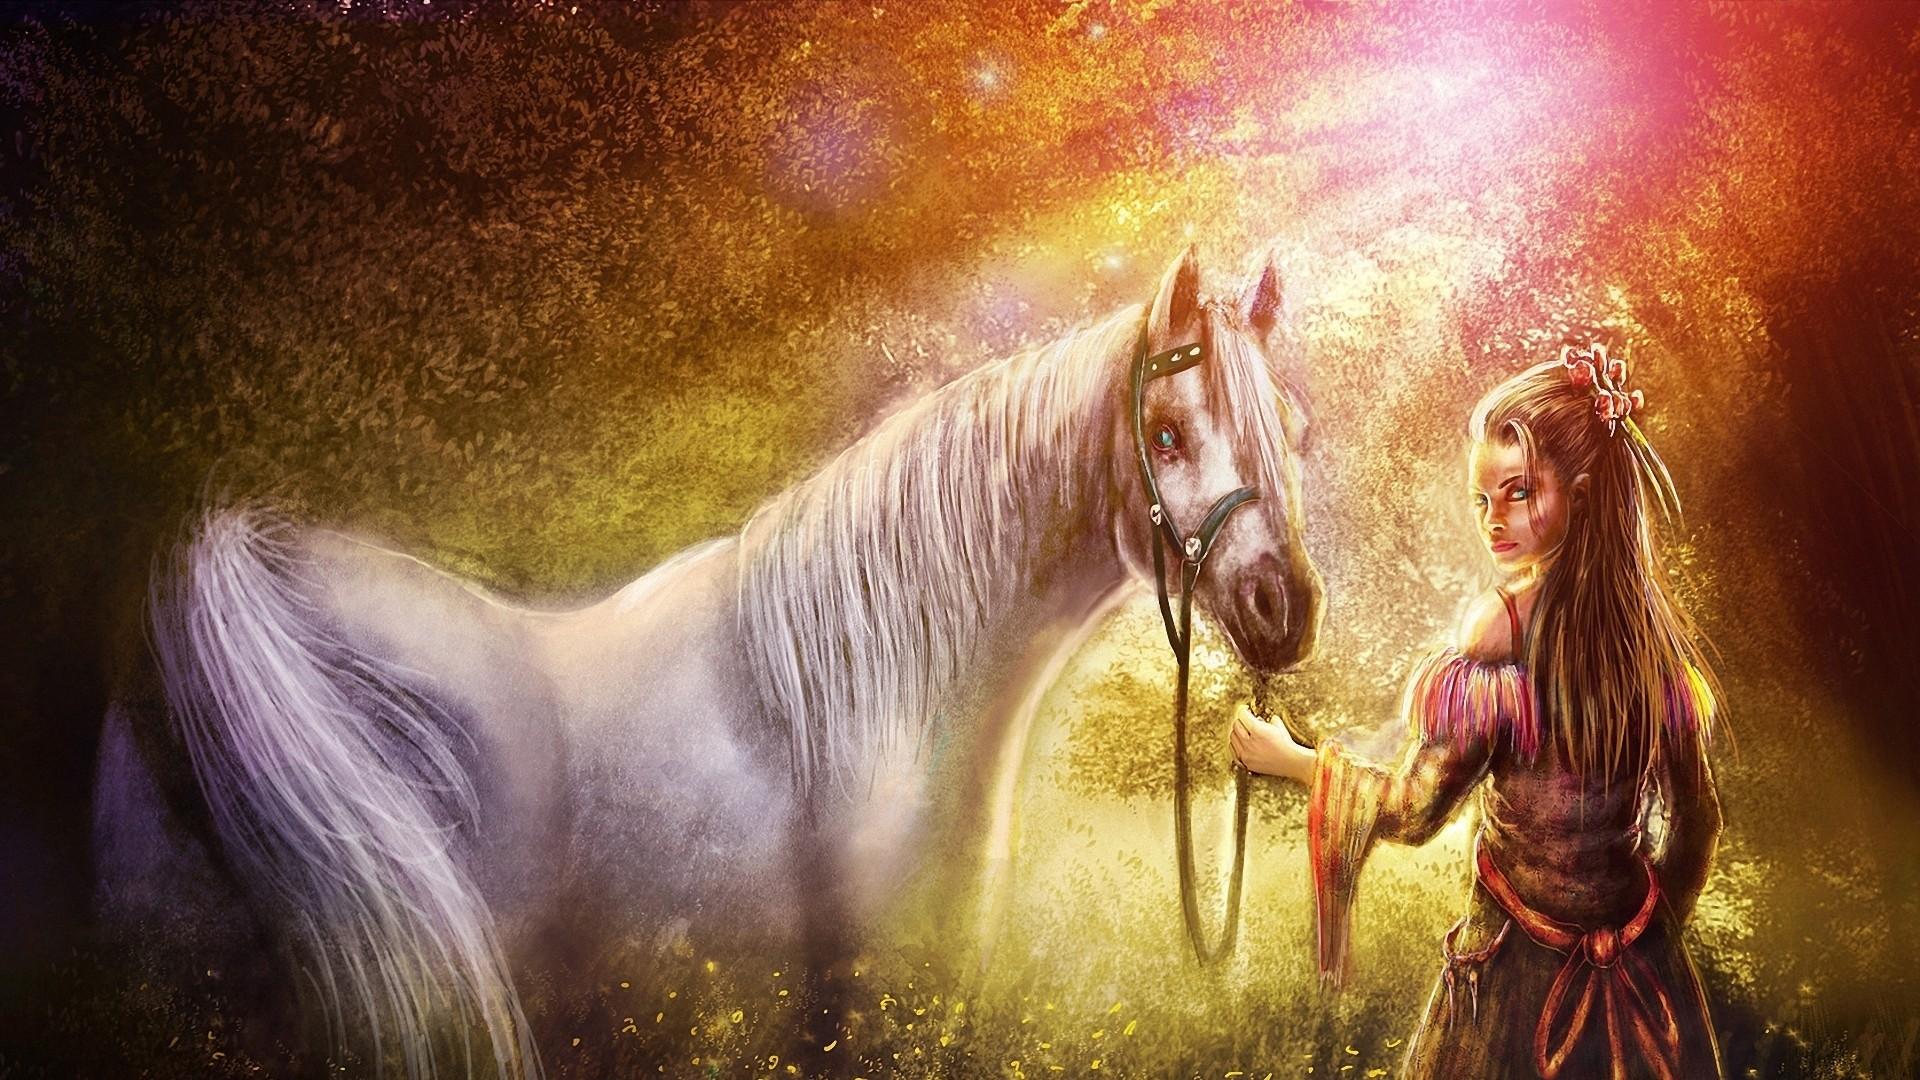 Wallpaper girl, horse, wood, art, nature, fantasy